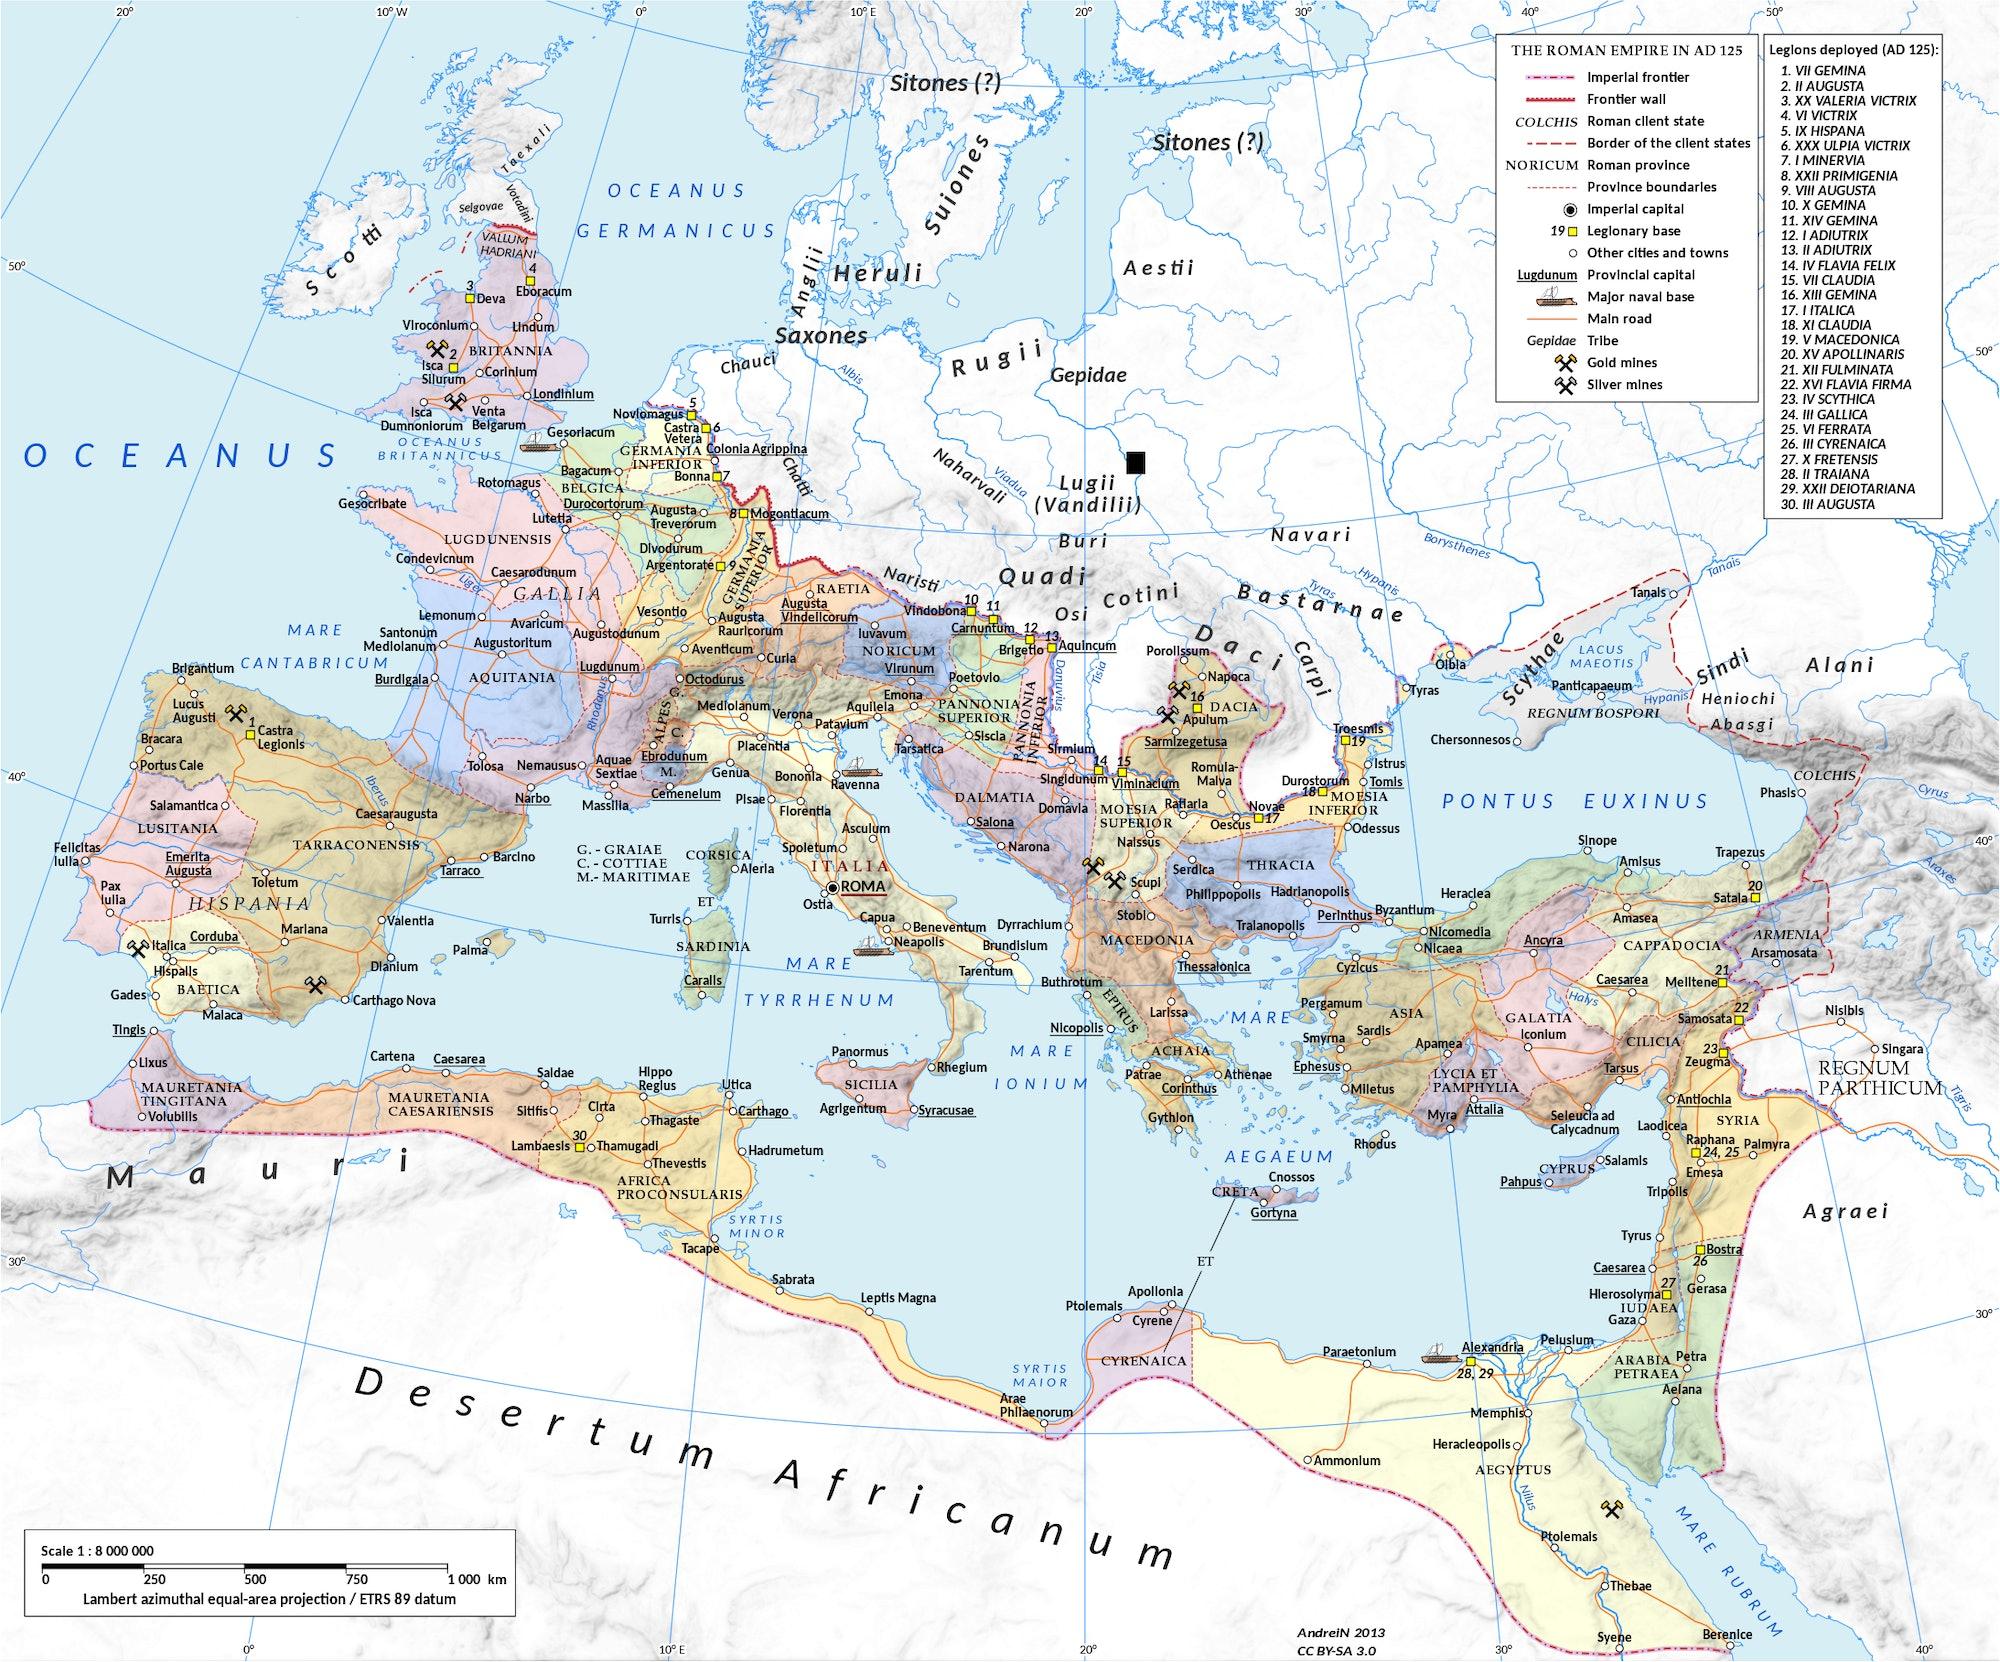 Roman Empire map Europe Africa